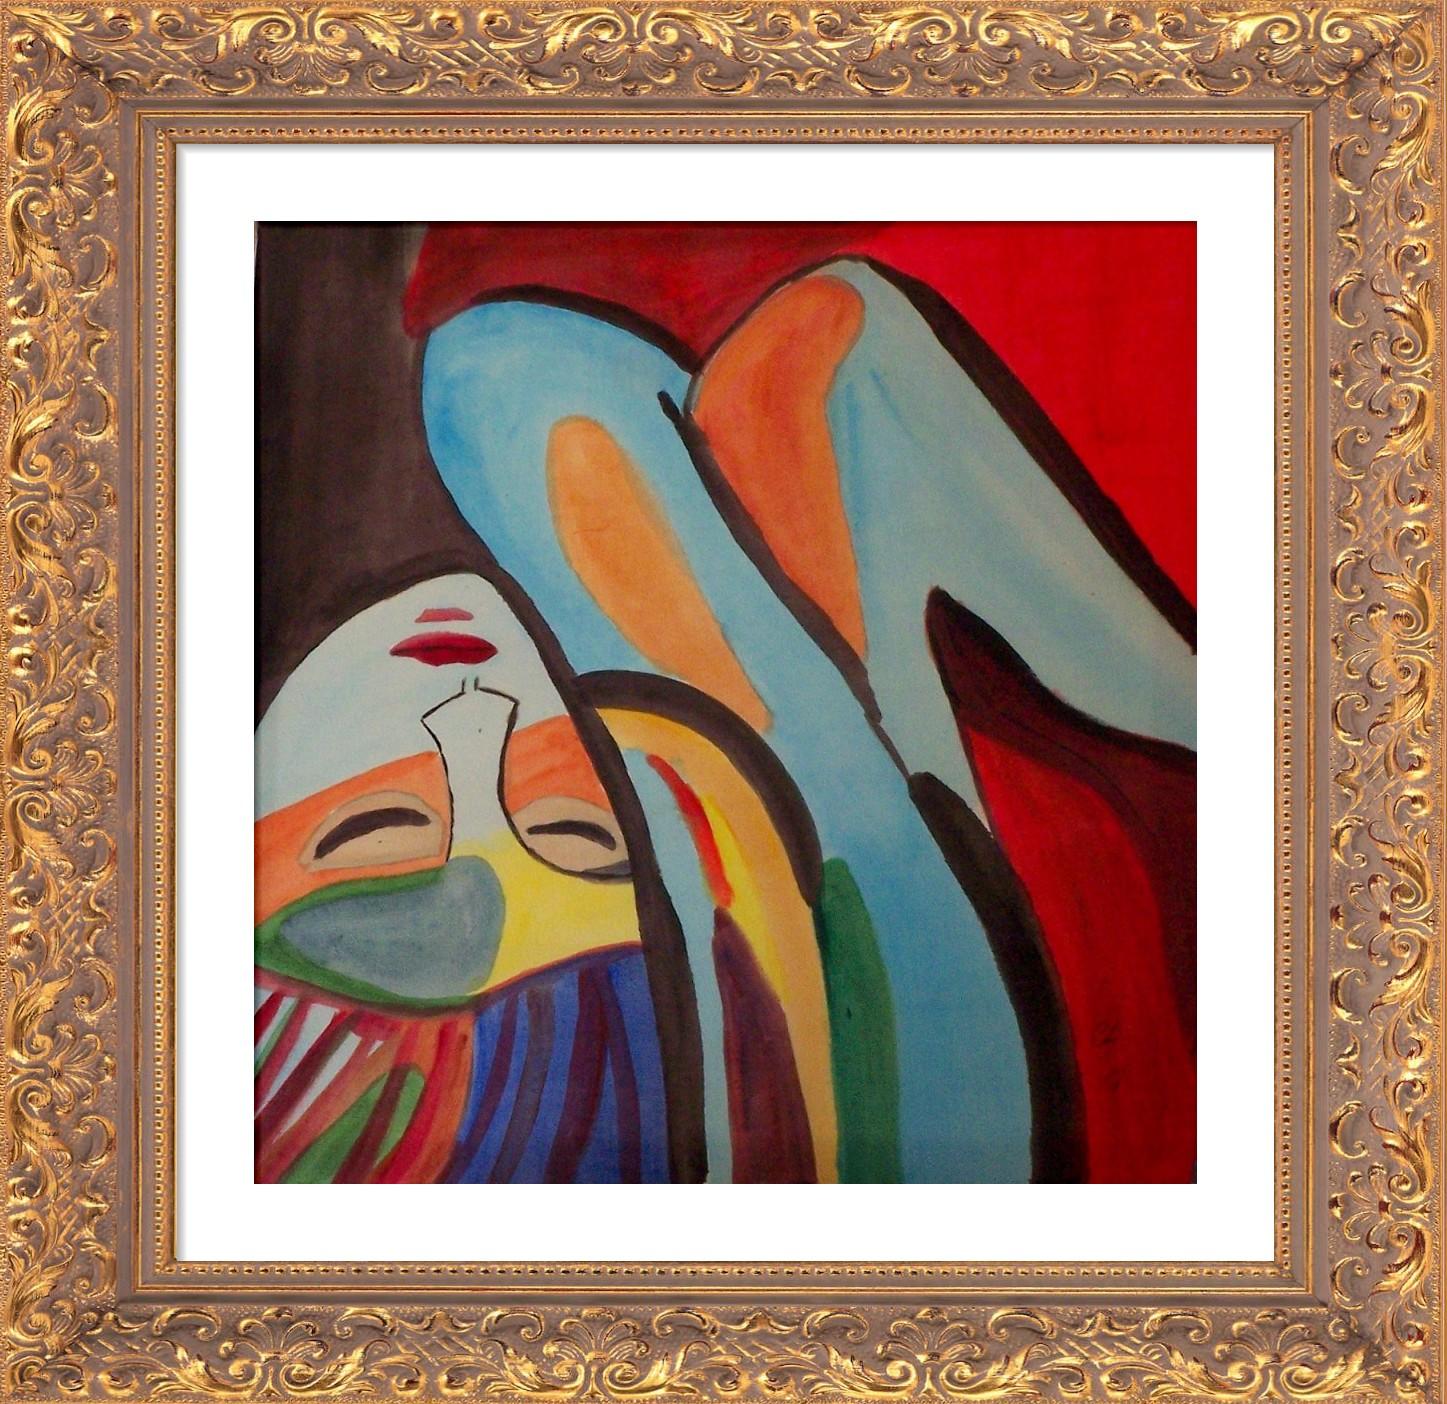 Abstrakte Malerei Vergnugt